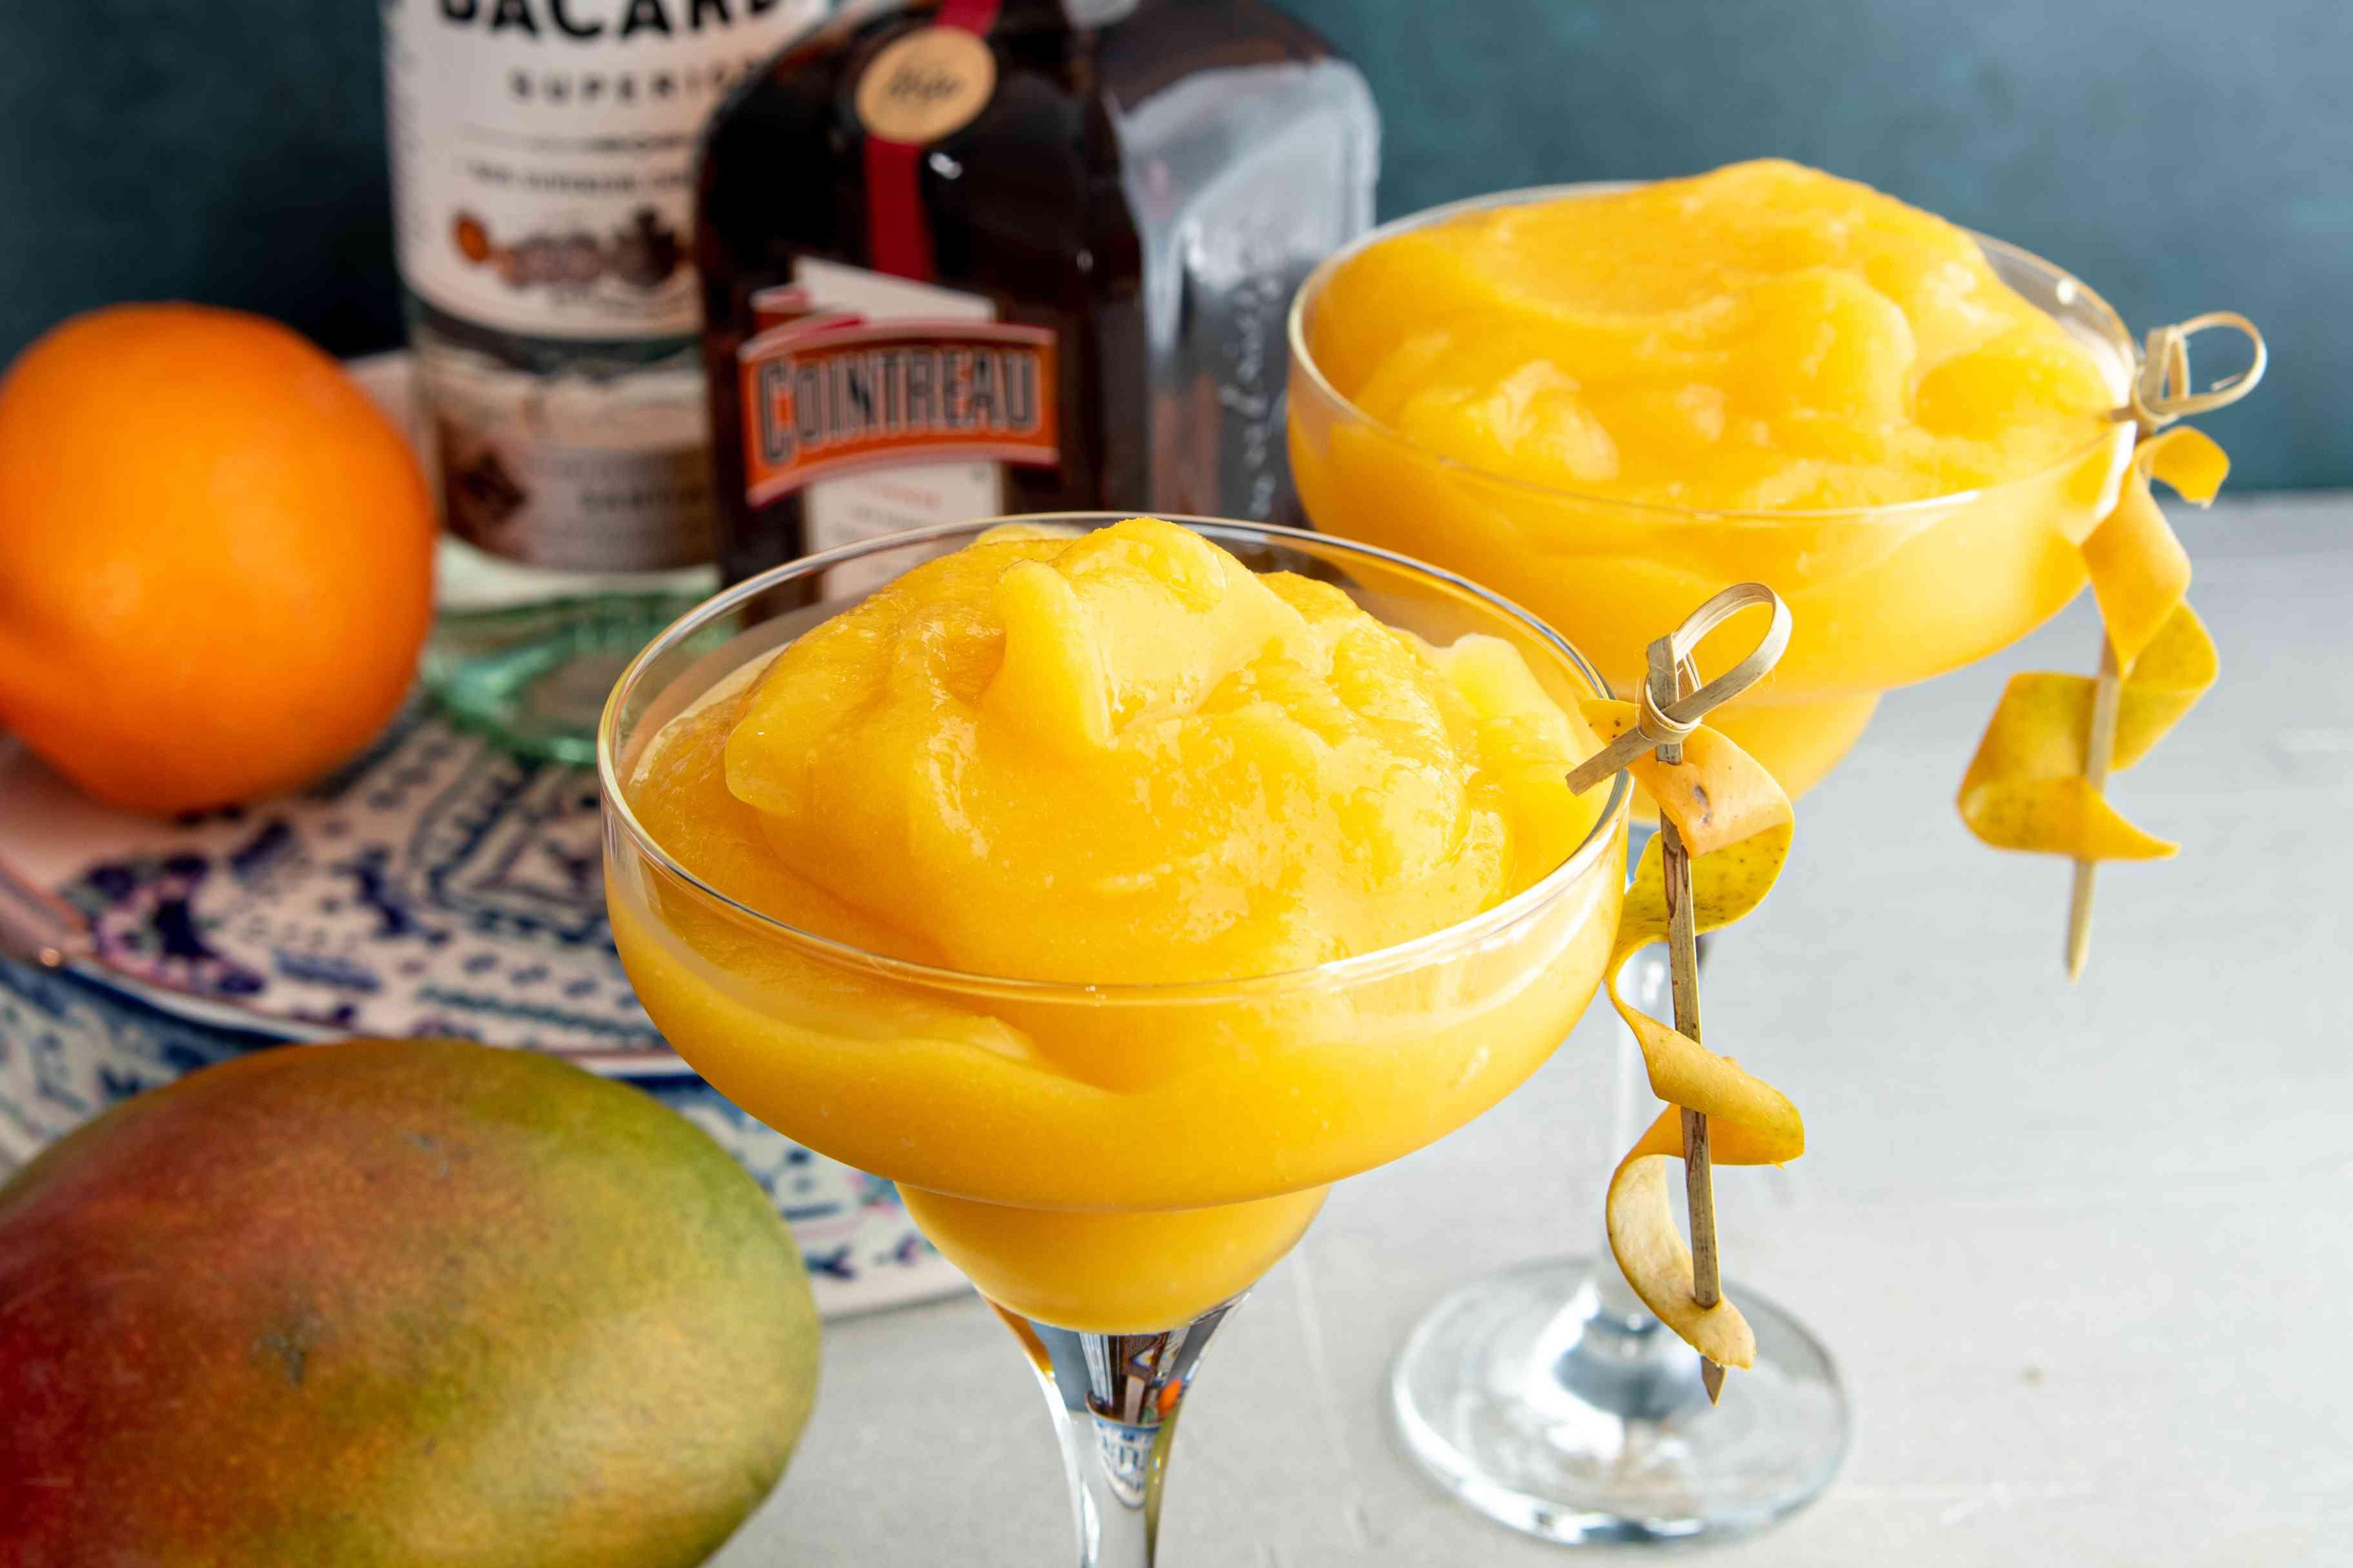 Frozen mango daiquiris in martini glasses garnished with curled mango peel.